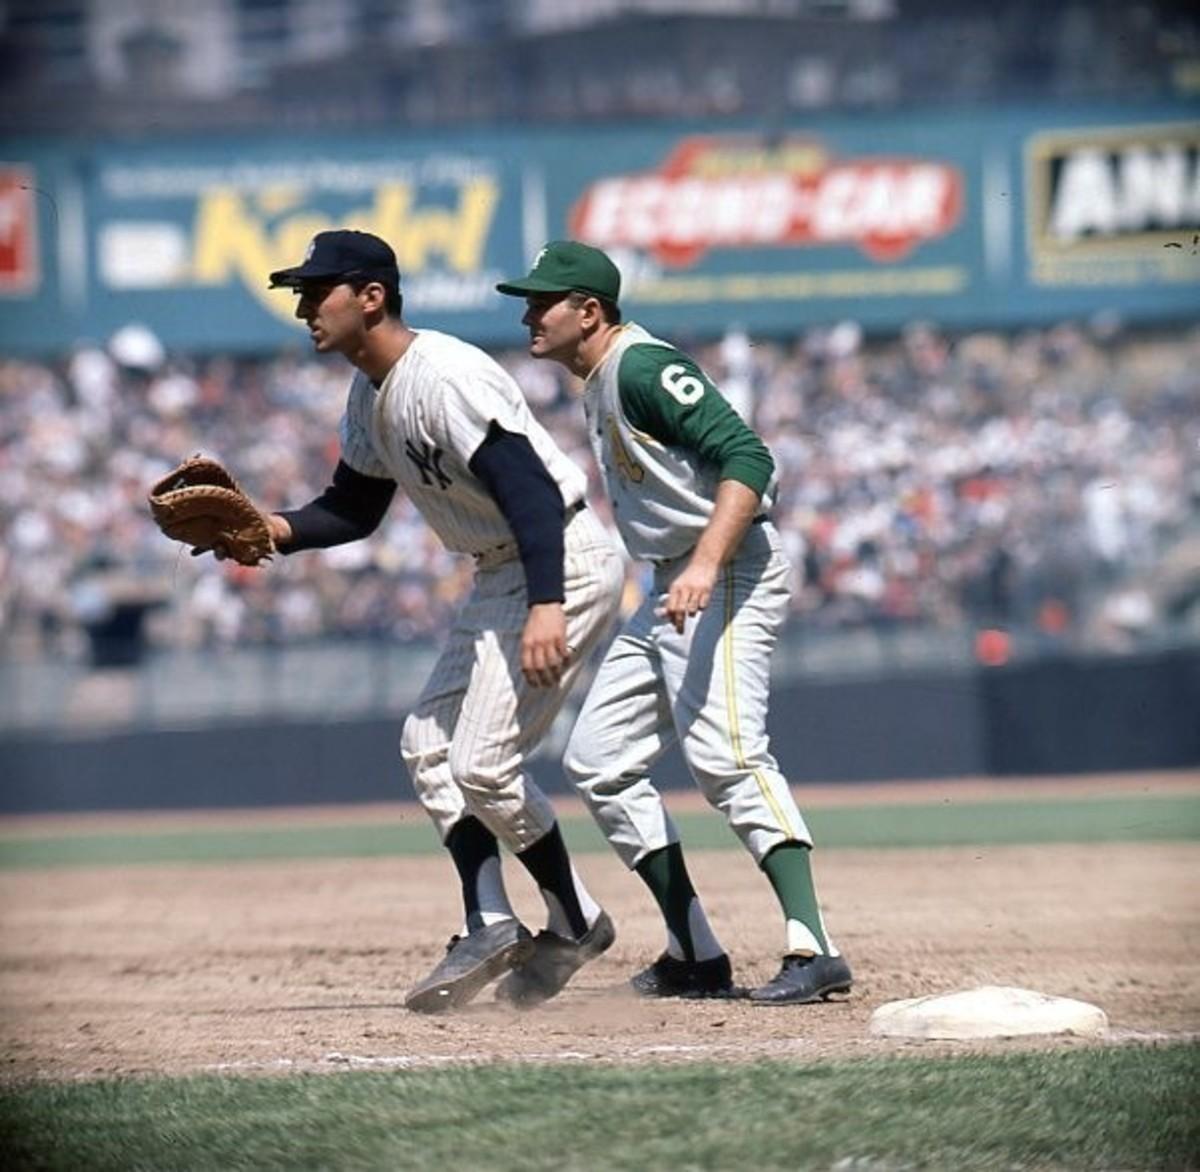 Despite the turmoil, Joe Pepitone had a great season with his bat and glove.